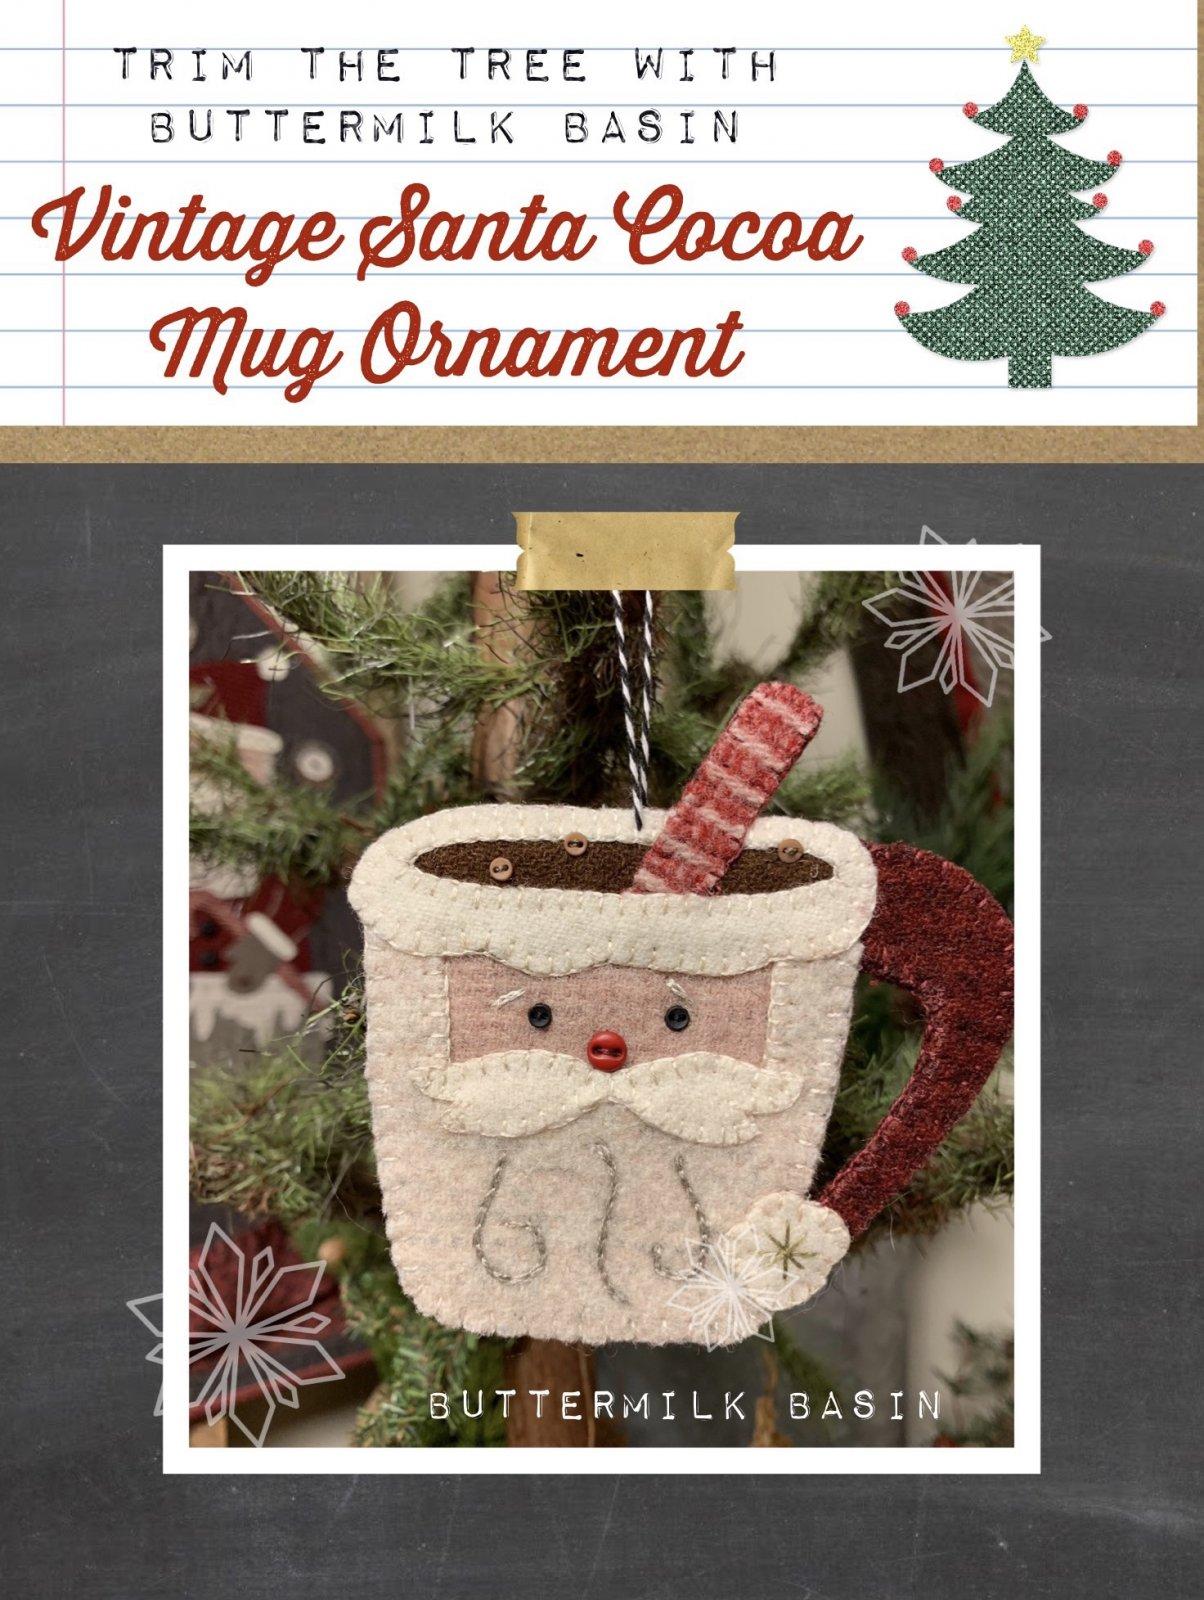 Vintage Santa Cocoa Mug Ornament * Pattern & Kit